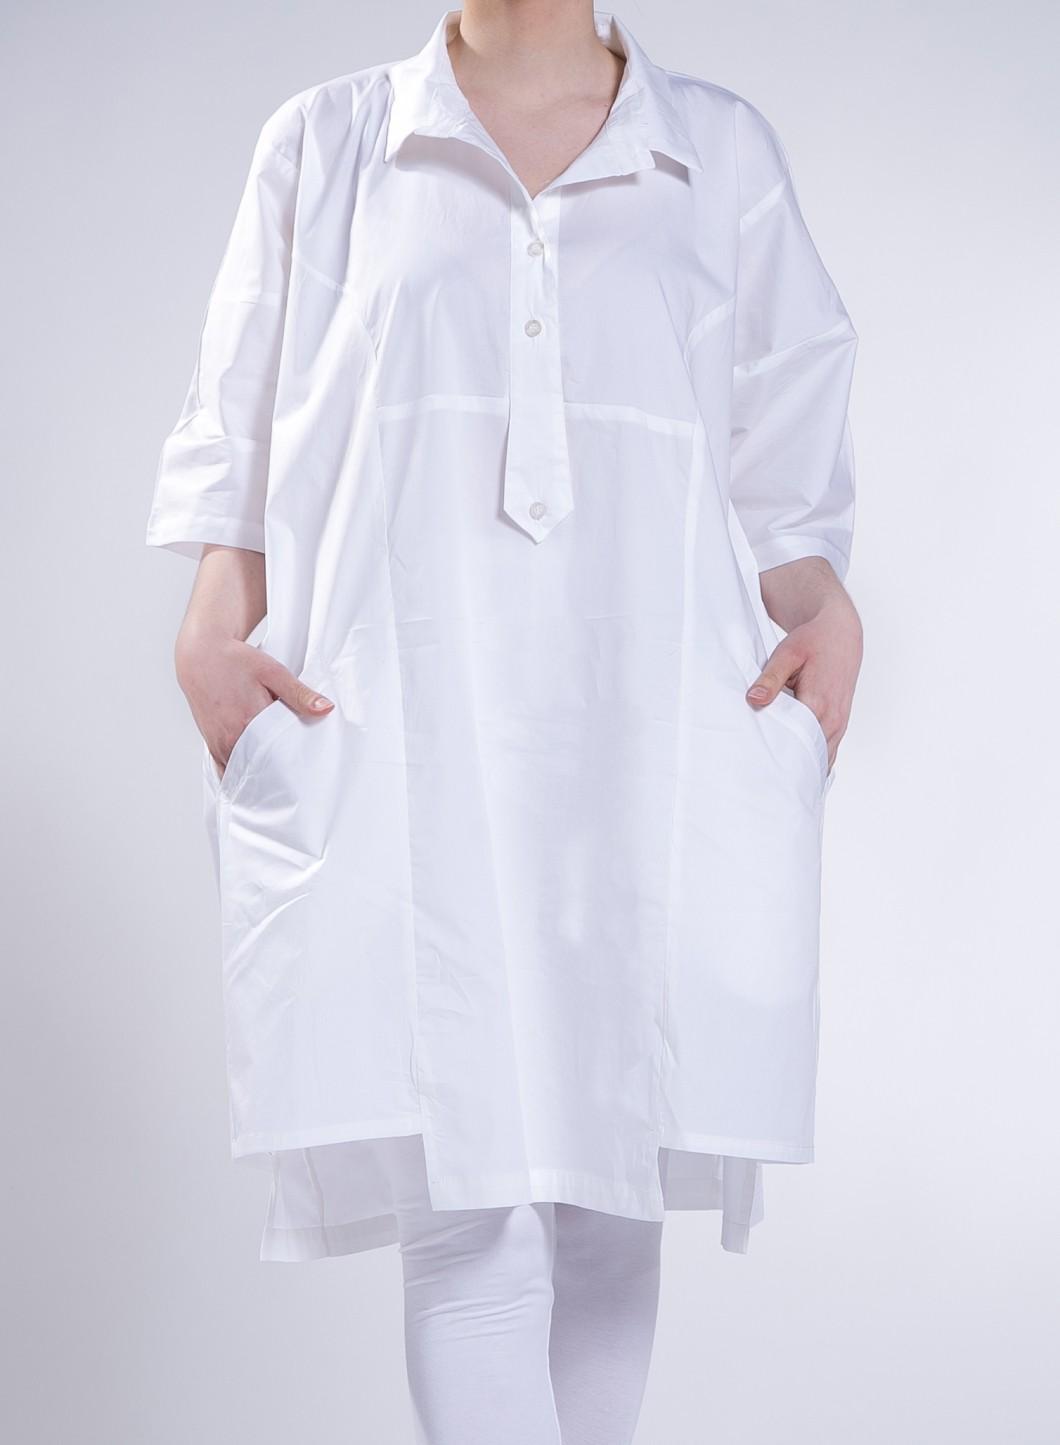 Shirt pat pockets short sleeve evita for Short sleeve shirts with pockets